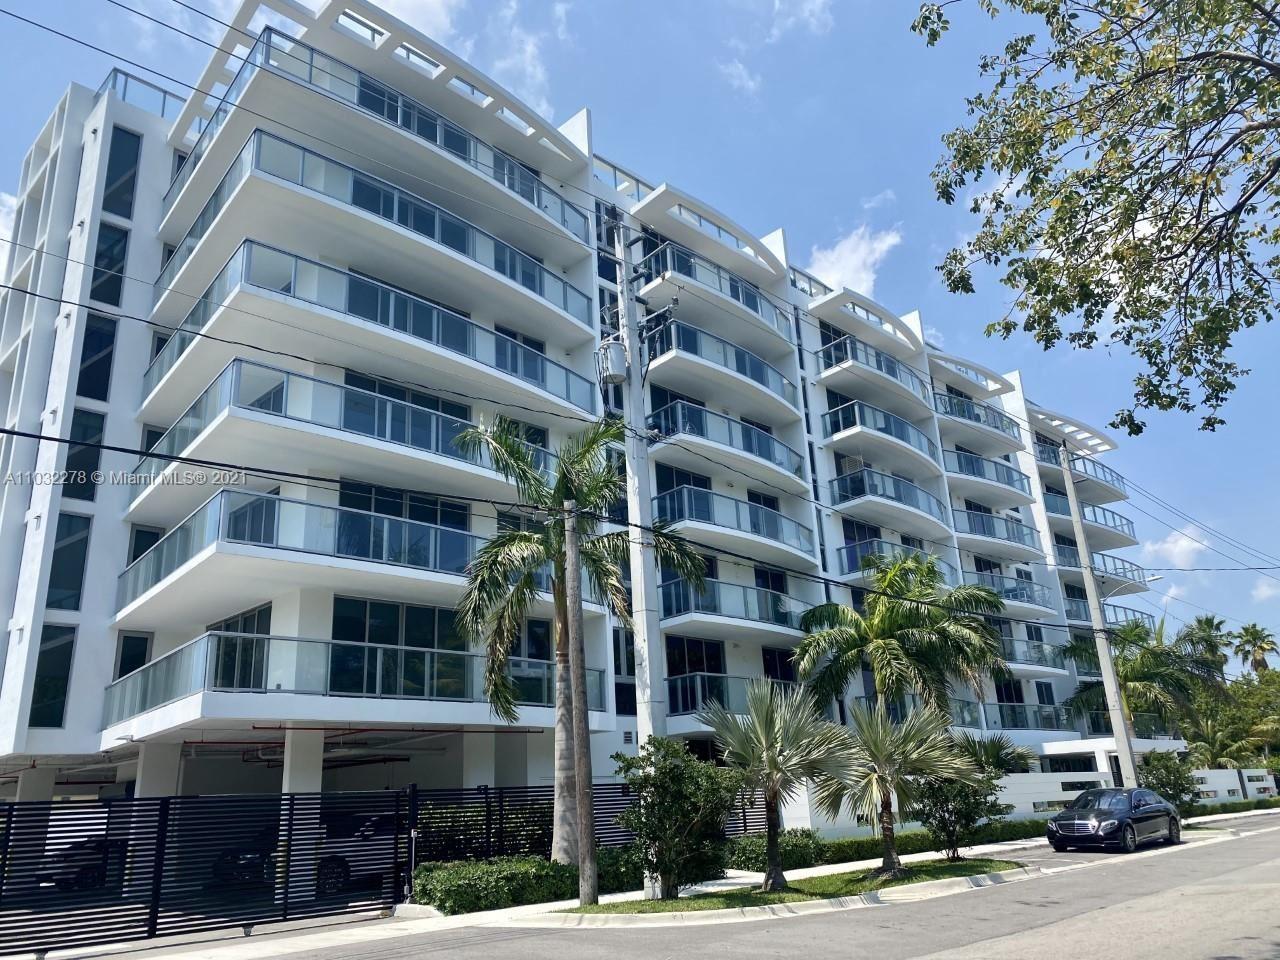 13800 Highland Dr #308, North Miami Beach, FL 33181 - #: A11032278